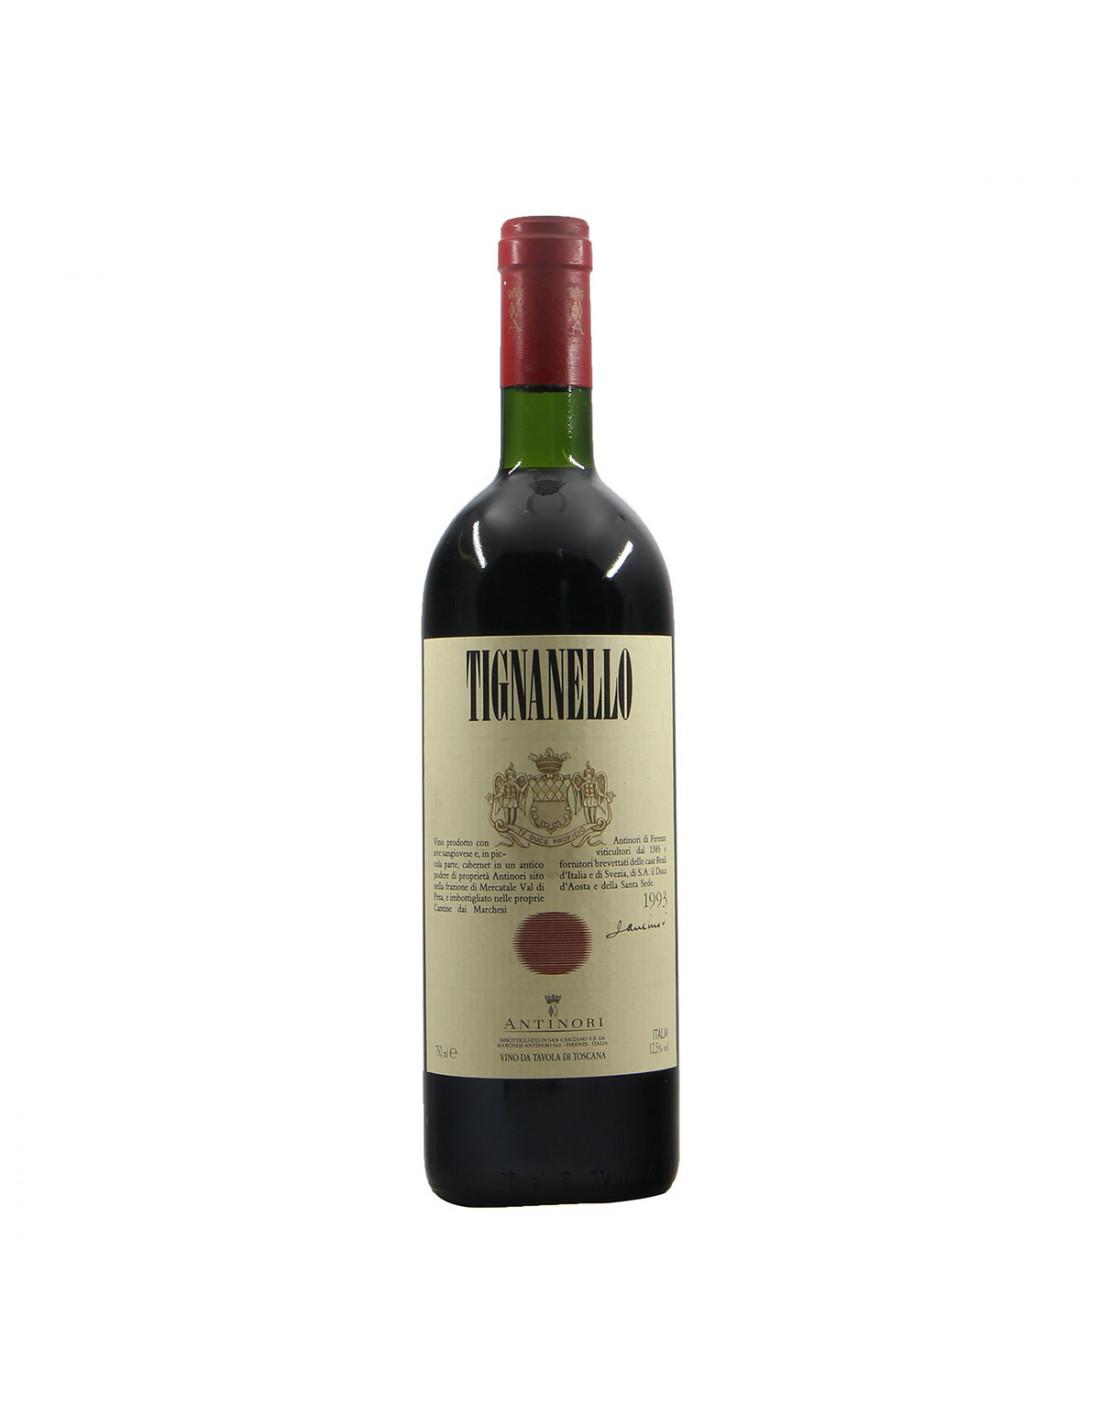 Antinori Tignanello 1993 Grandi Bottiglie